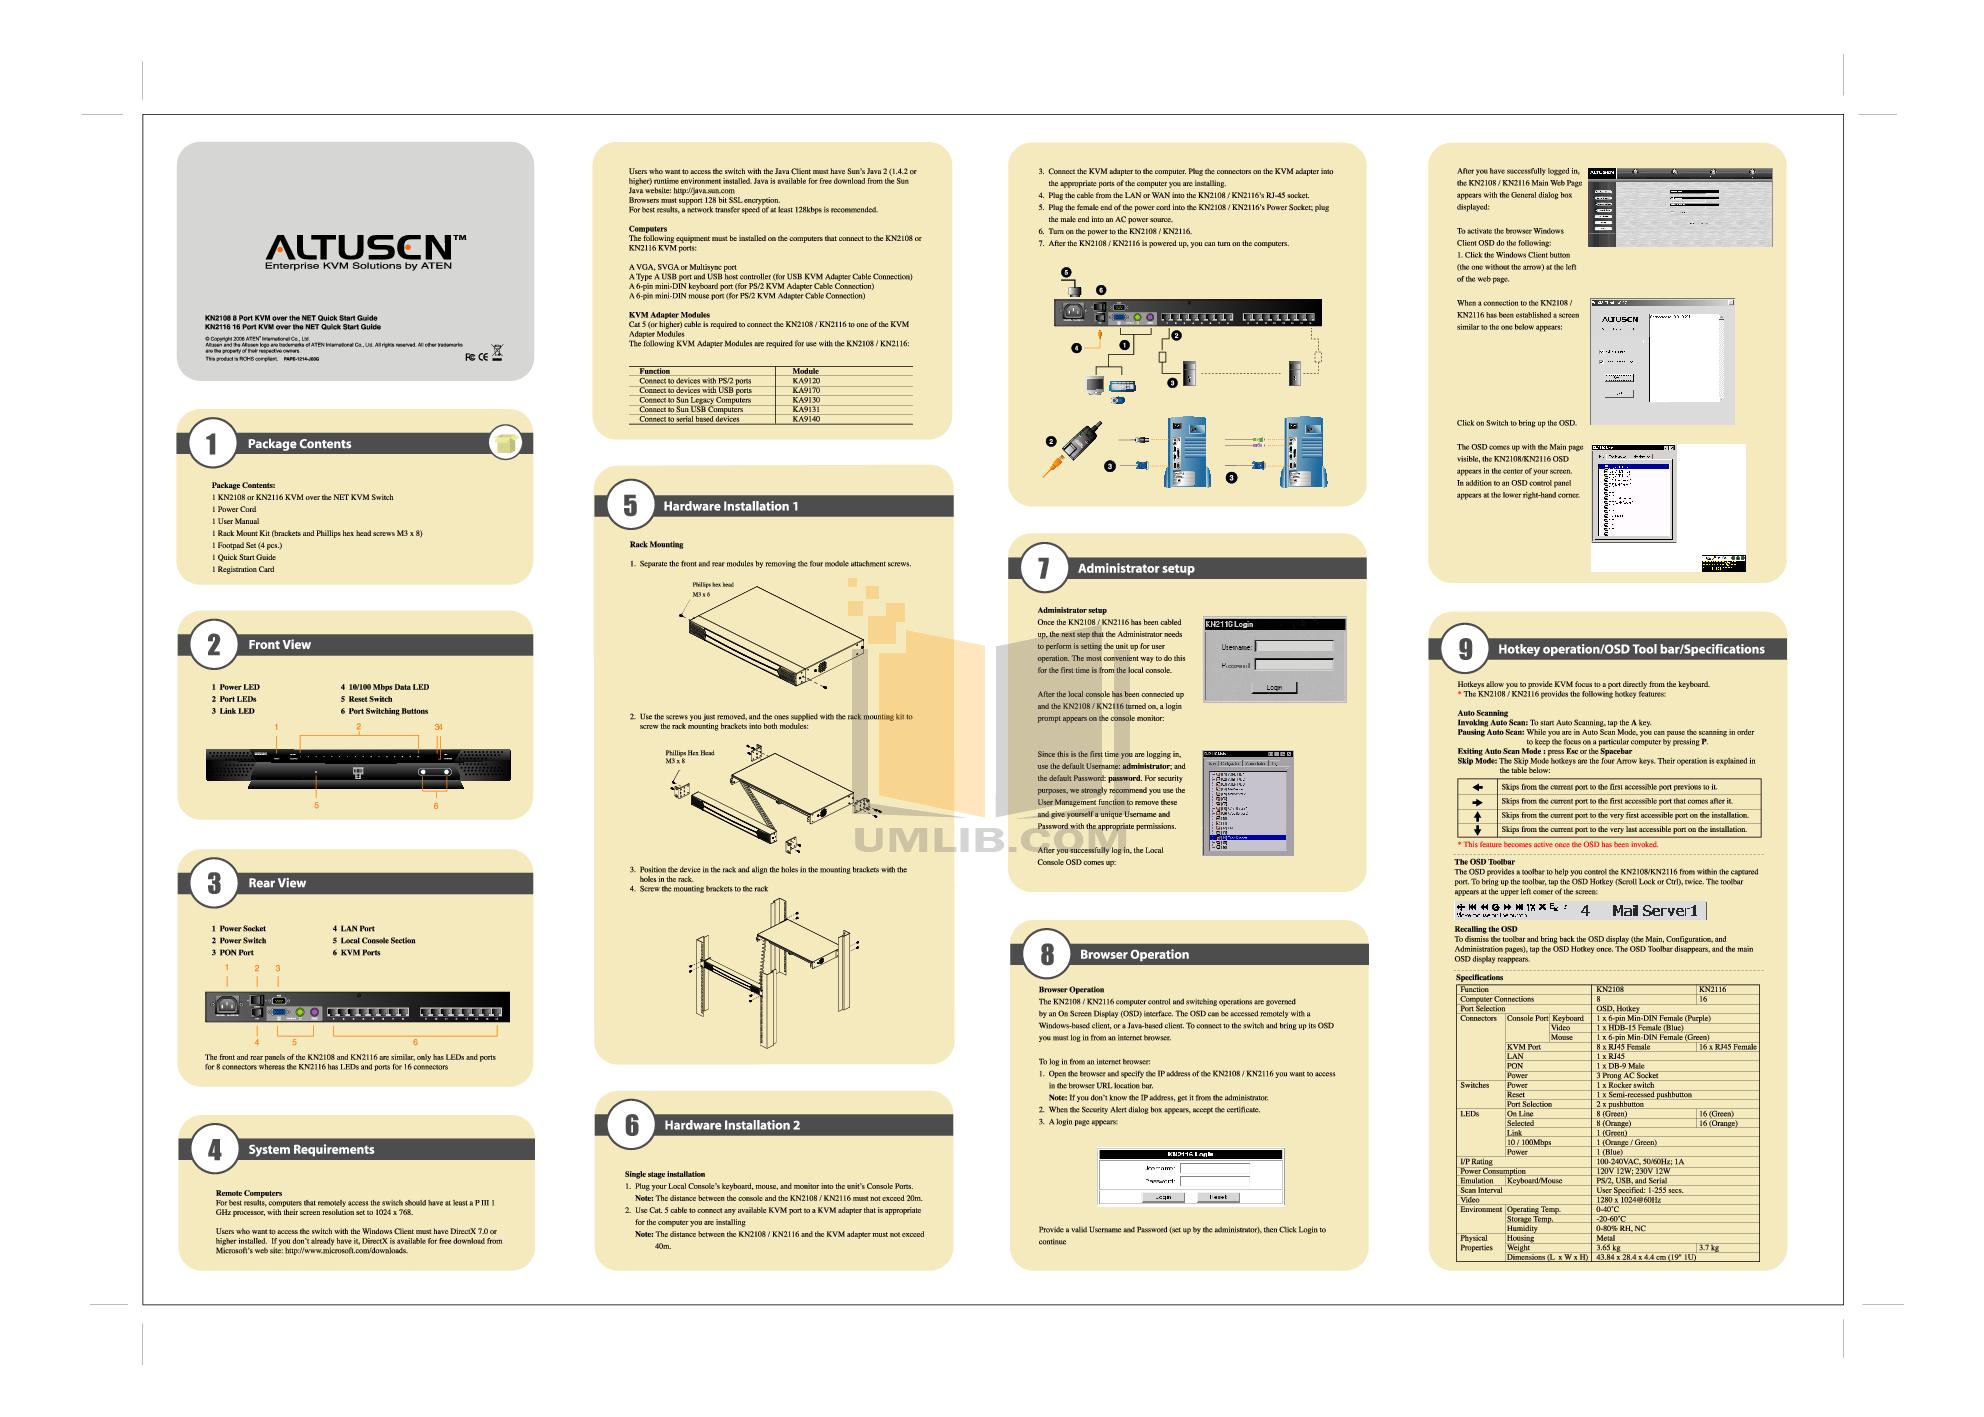 pdf for ATEN Other Altusen KN-2116 KVM Switch manual